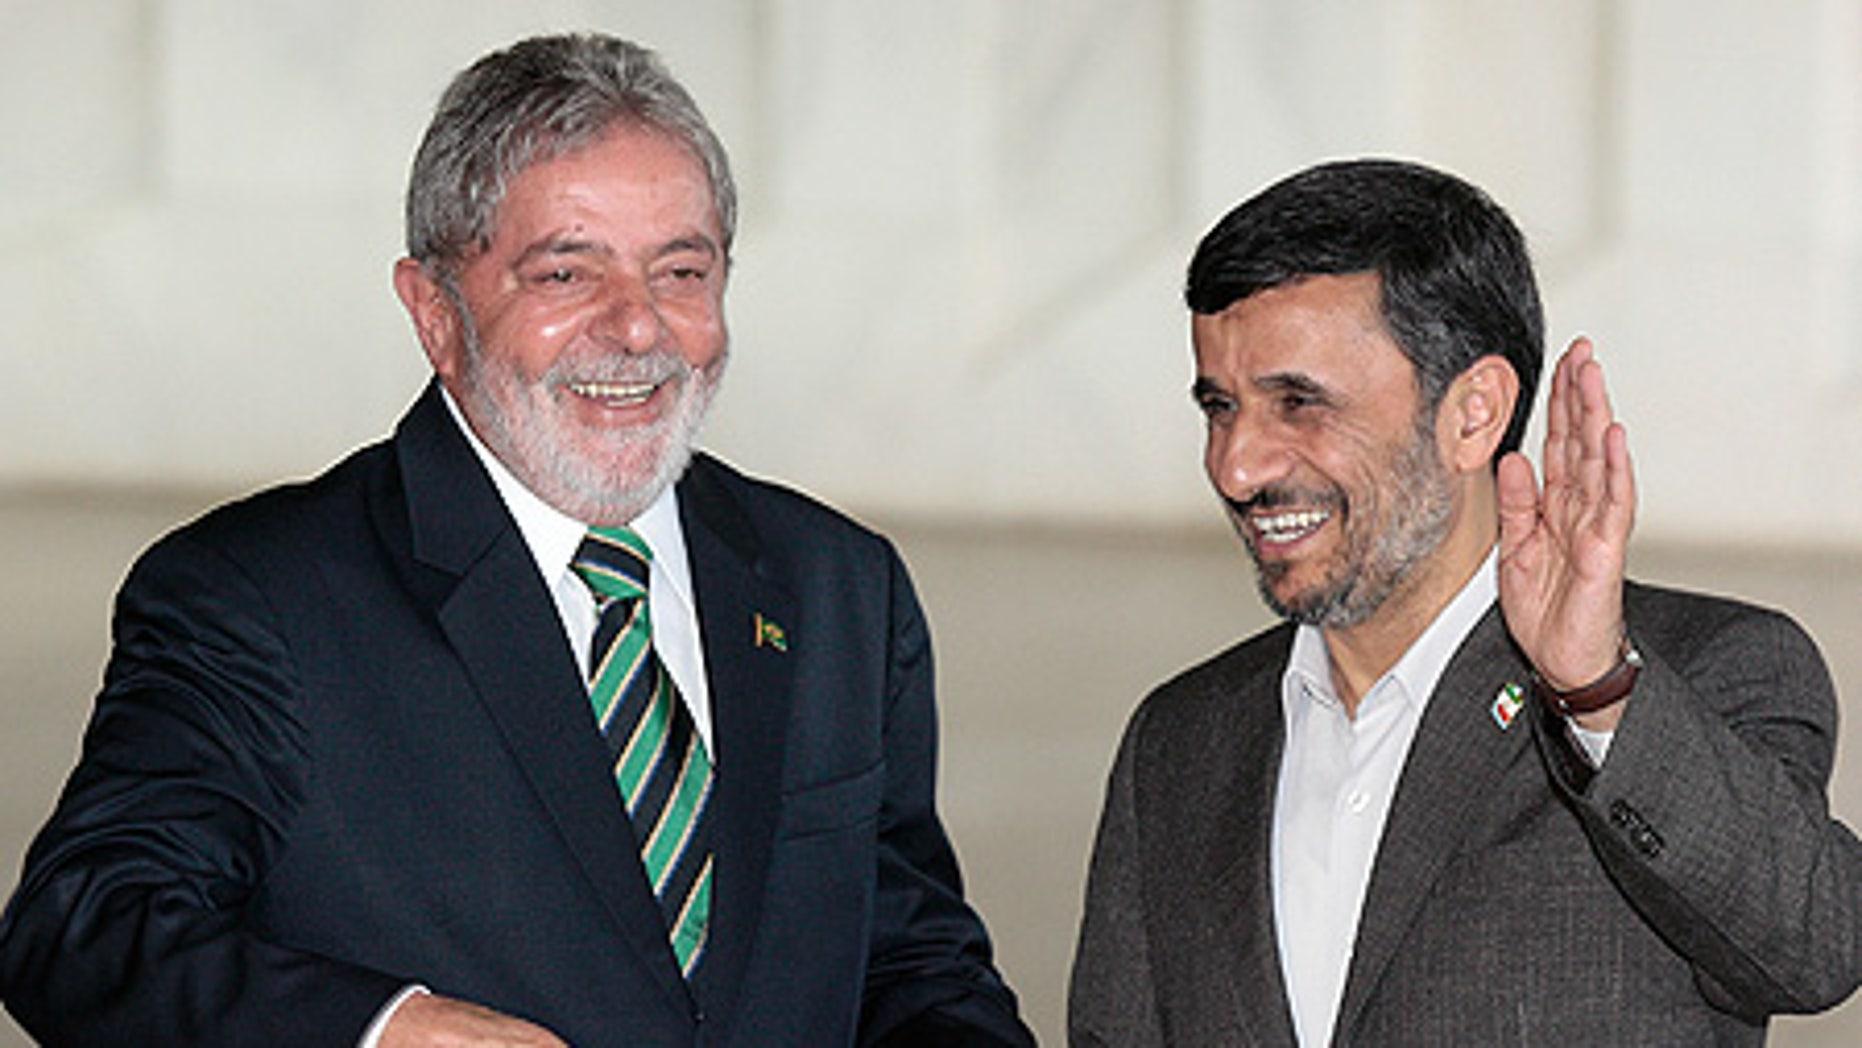 Nov. 23: Iran's President Mahmoud Ahmadinejad, right, waves as he stands with Brazil's President Luiz Inacio Lula da Silva at the Itamaraty palace.